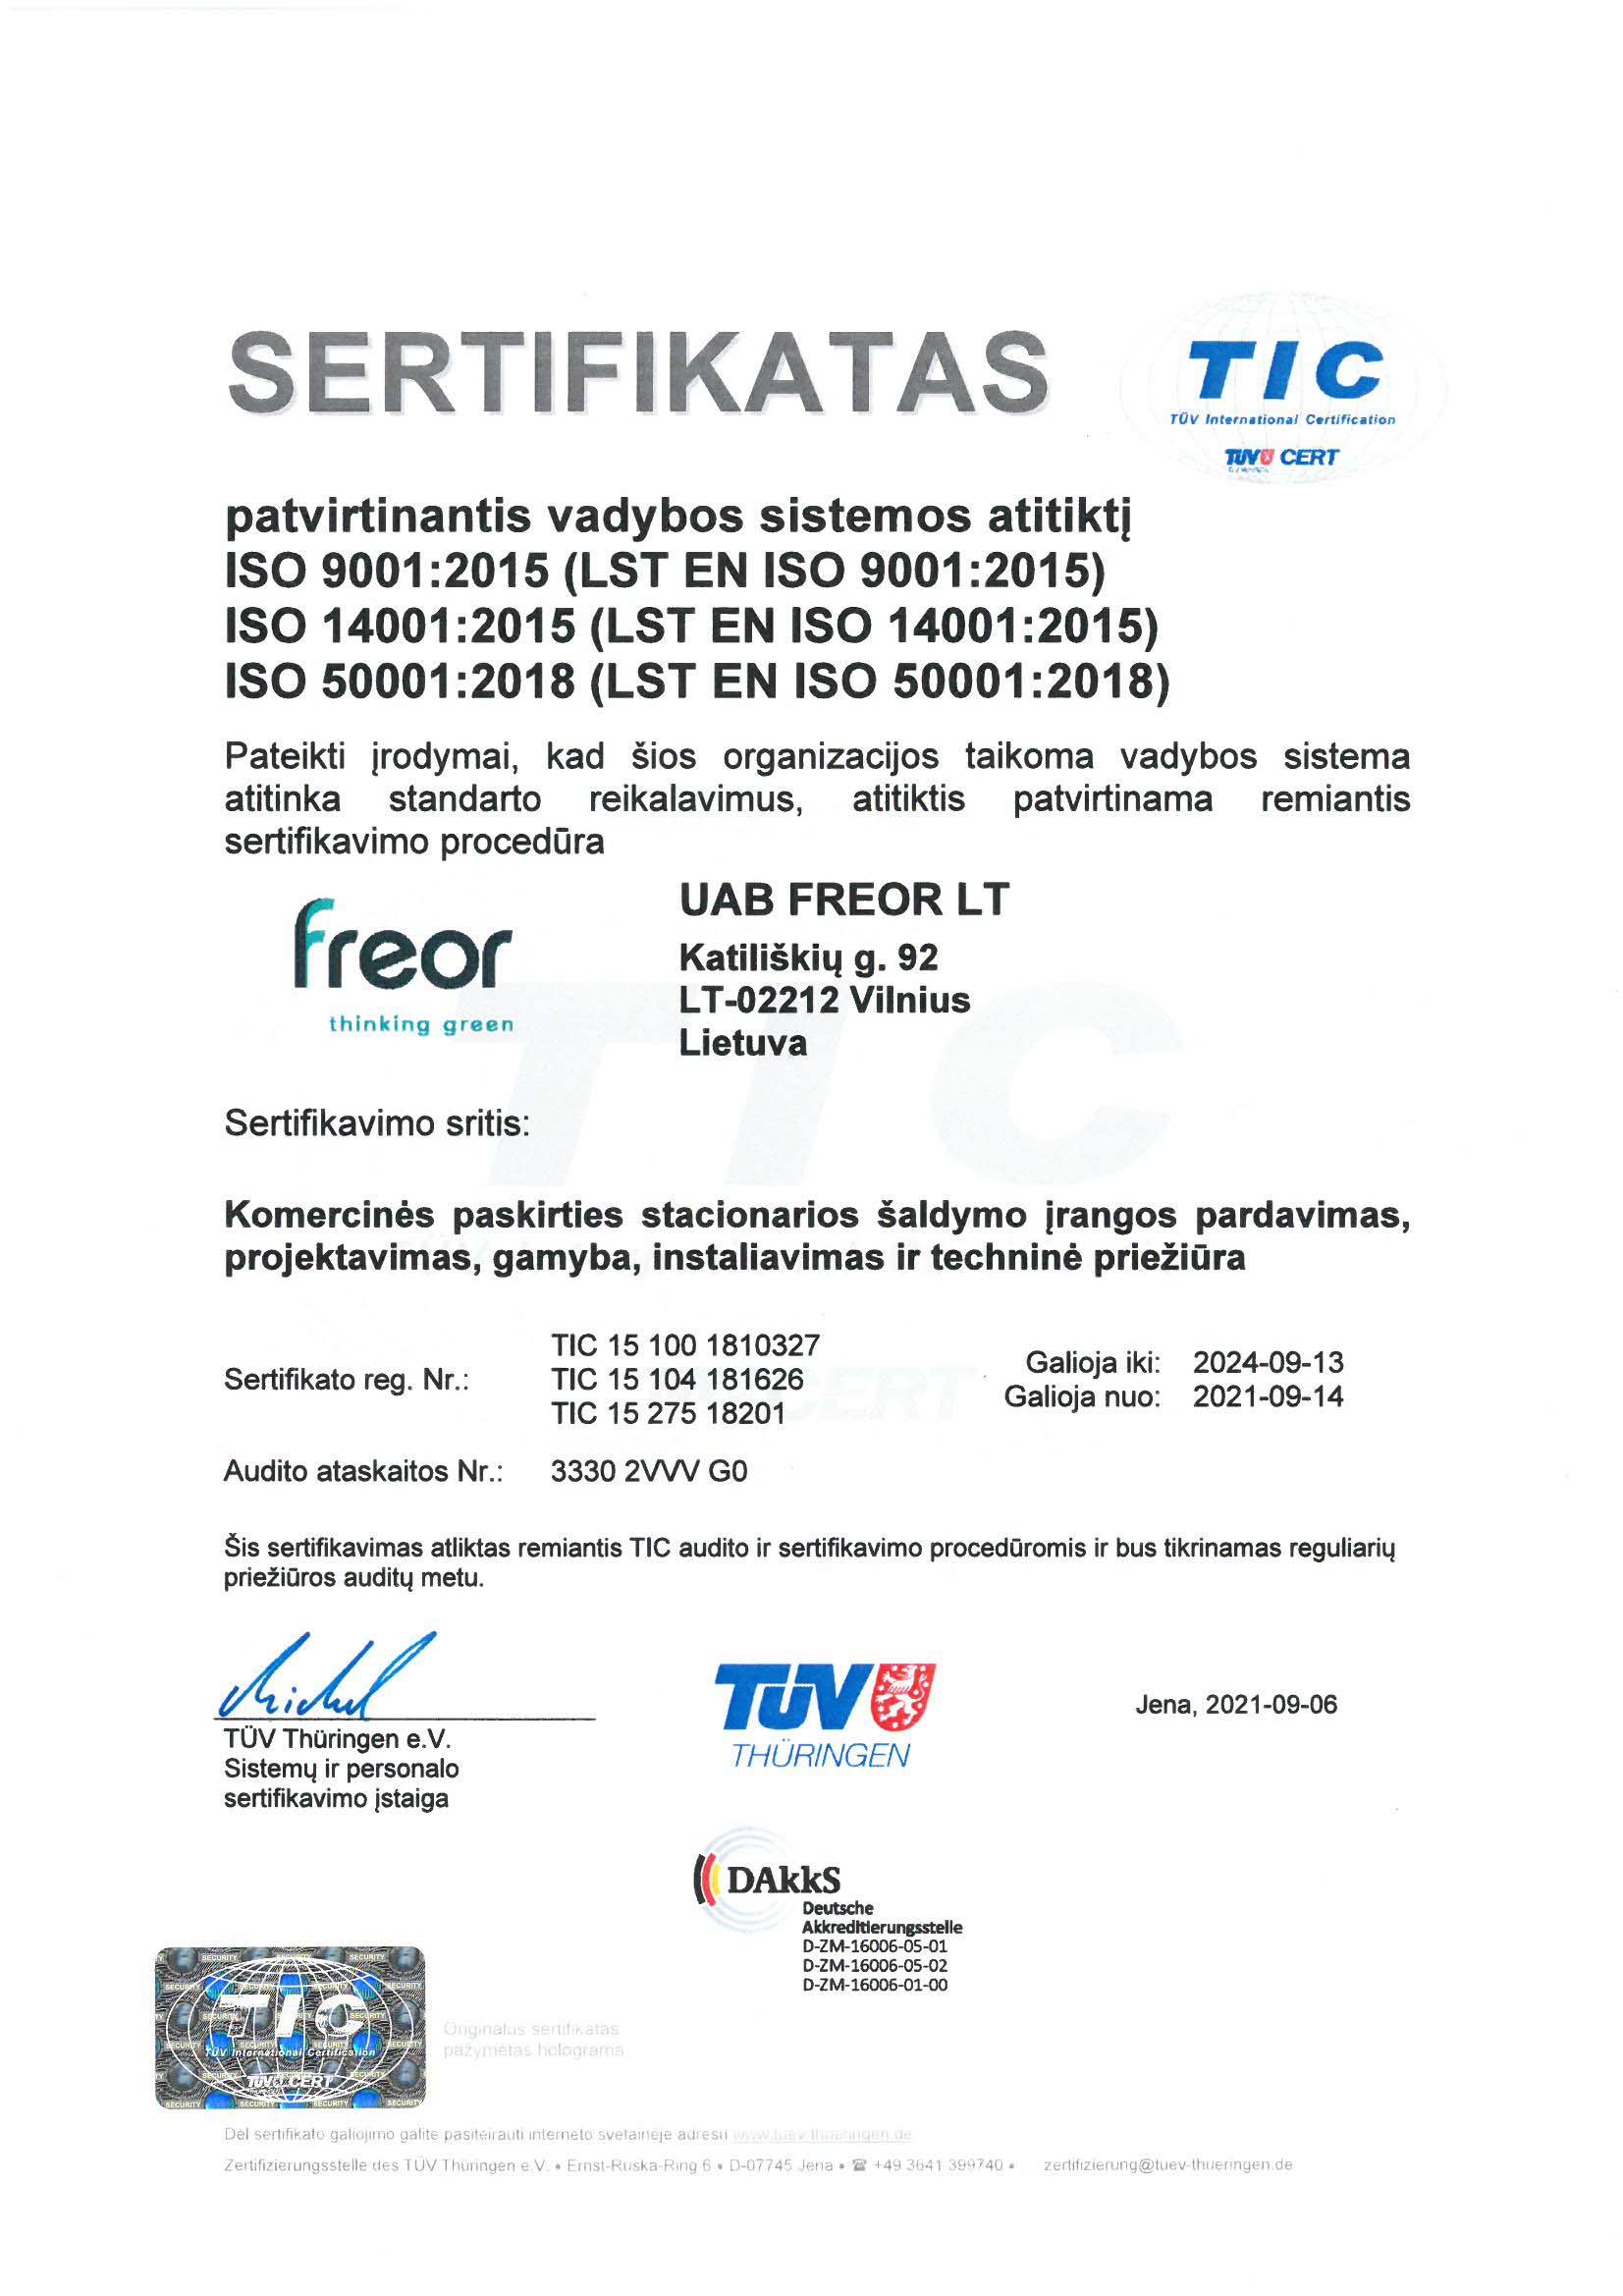 FREOR-certificate-ISO-50001-9001-14001_LT_naujas